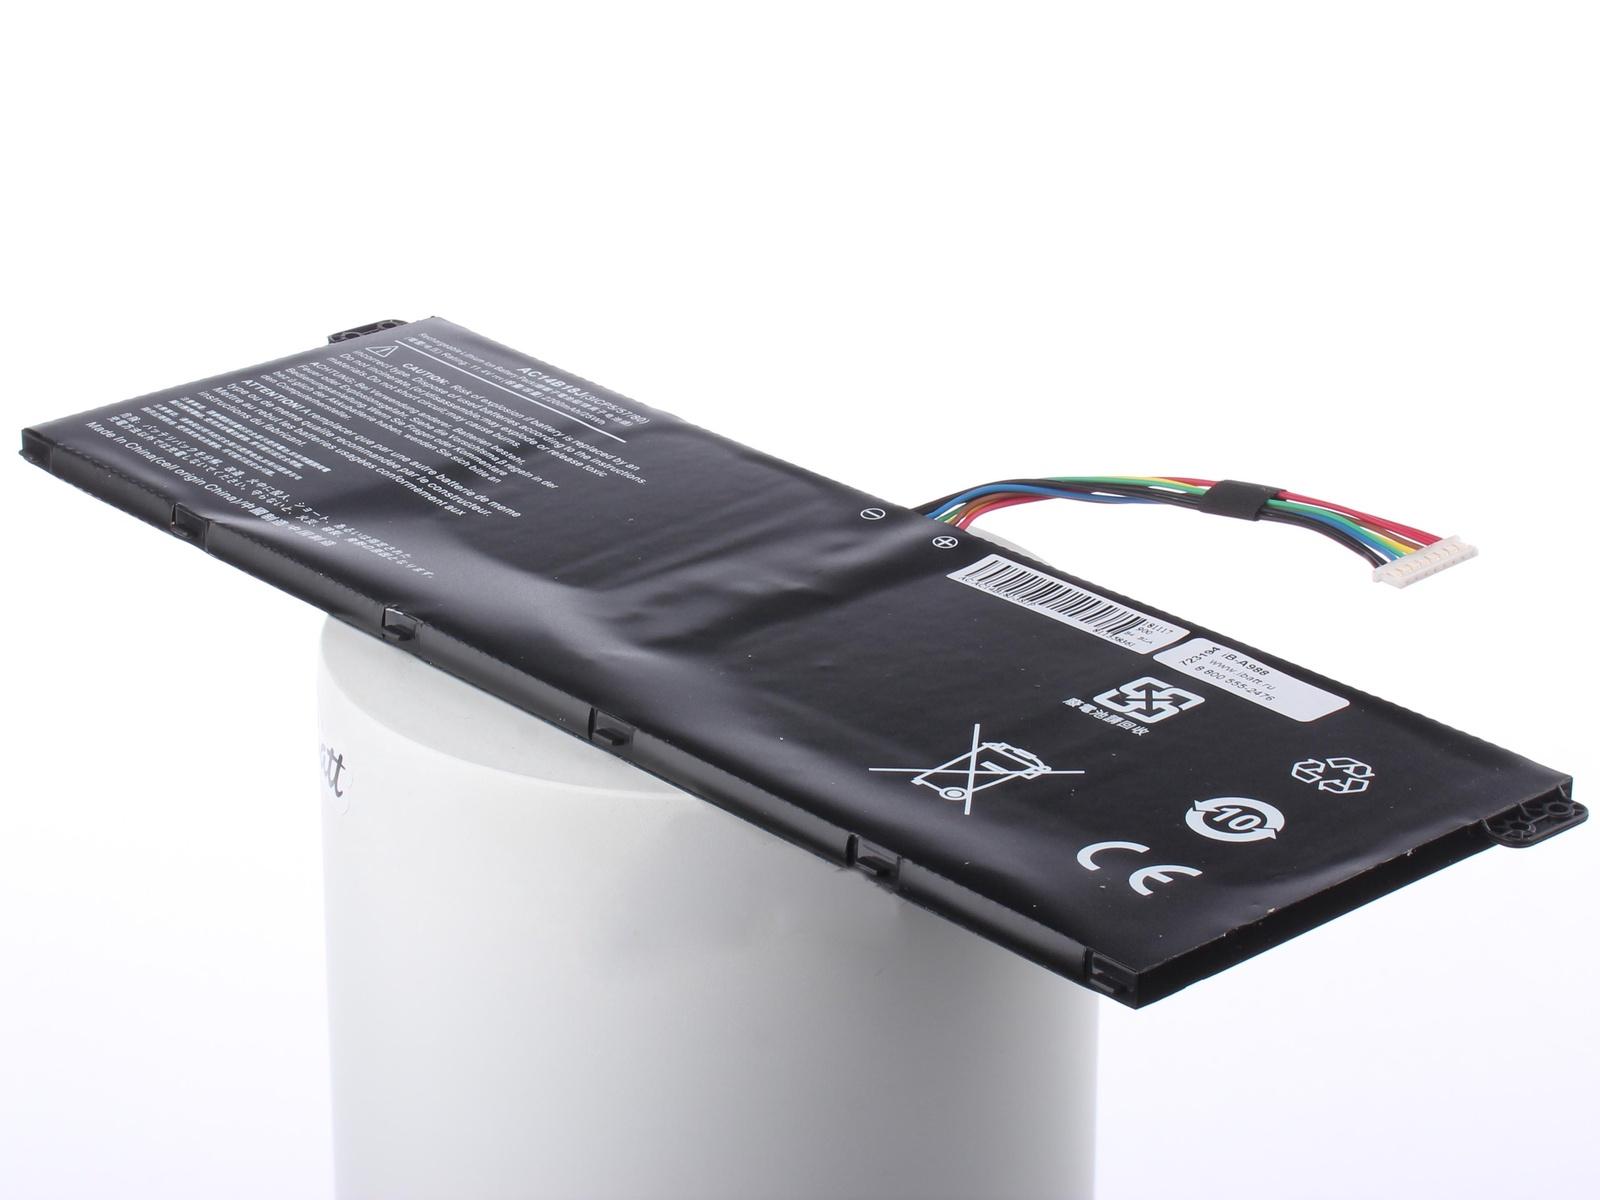 Аккумуляторная батарея iBatt iB-T6-A988 3220mAh для ноутбуков Acer Aspire ES1-521-67AT, ASPIRE ES1-731-C27P, ASPIRE ES1-731G-P76Q, Aspire ES1-131-C4QQ, Aspire ES1-131-C9L8, ASPIRE ES1-731G-P15K, Aspire ES1-731G-P4RL, Aspire ES1-331-C0TP, ноутбук acer aspire es1 731g c4e3 nx mzter 012